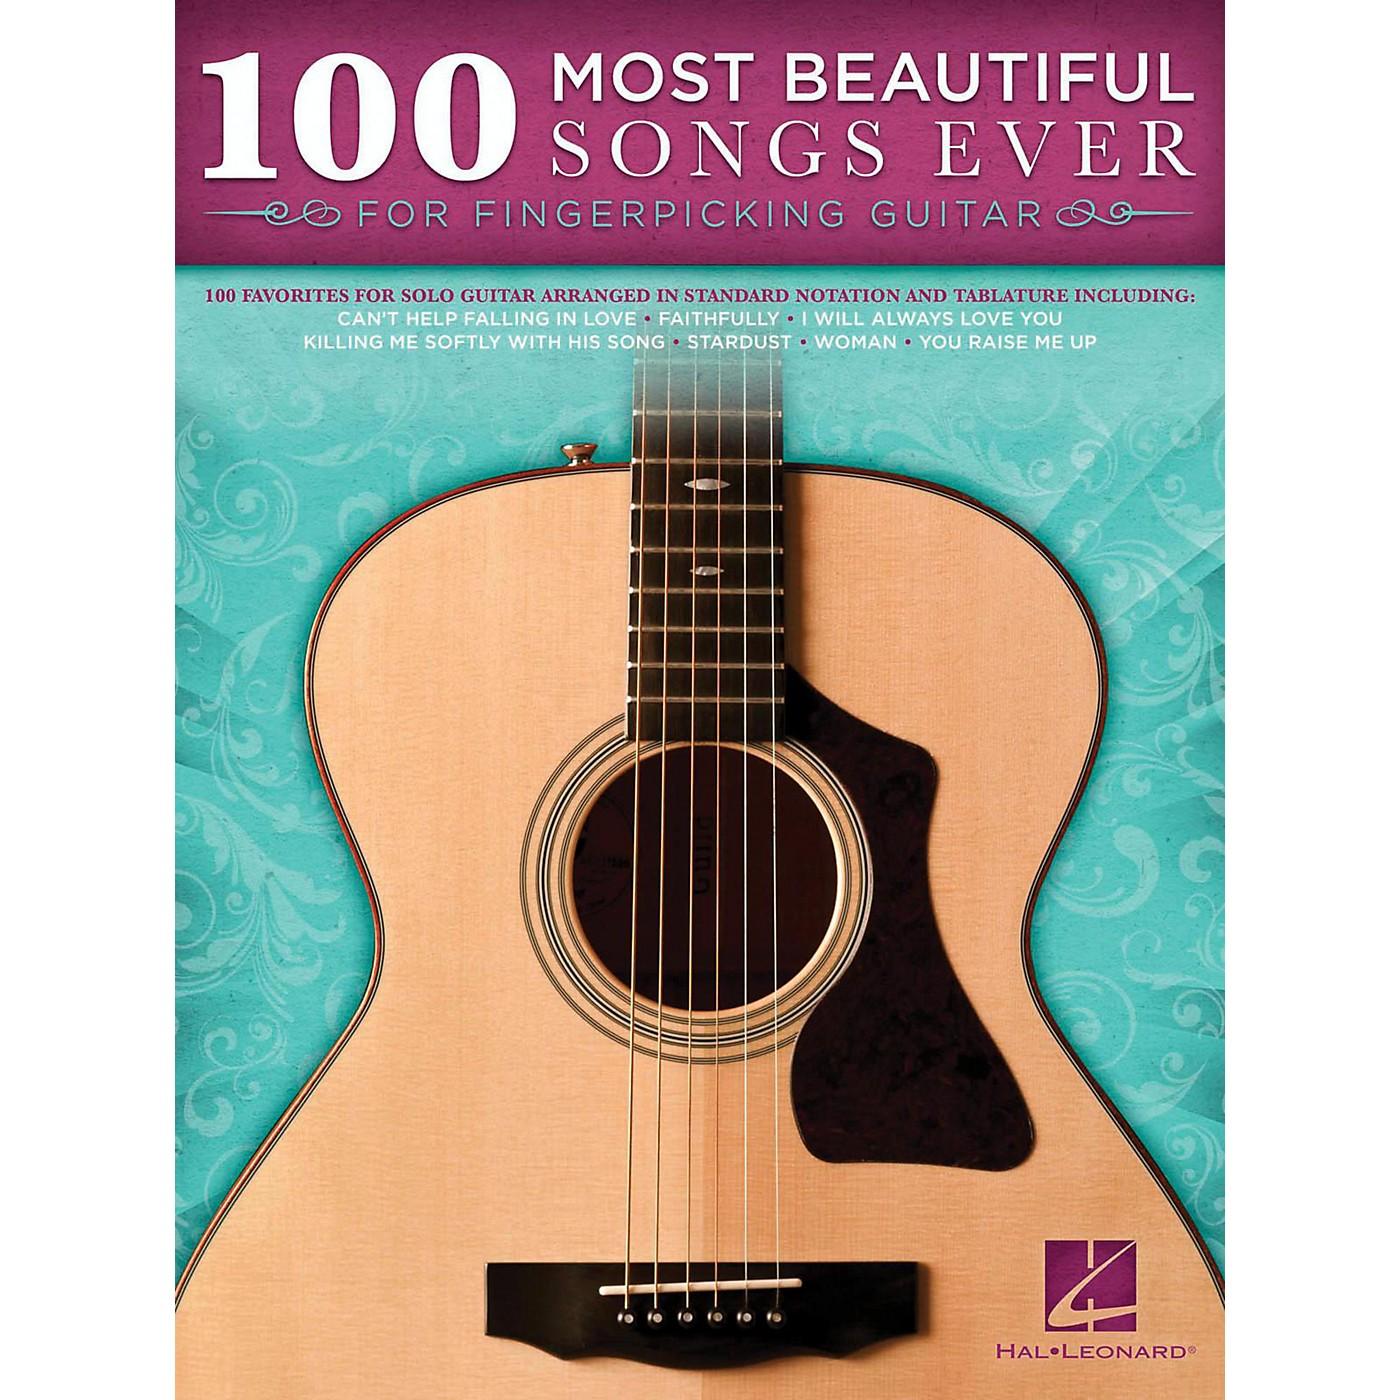 Hal Leonard 100 Most Beautiful Songs Ever For Fingerpicking Guitar thumbnail